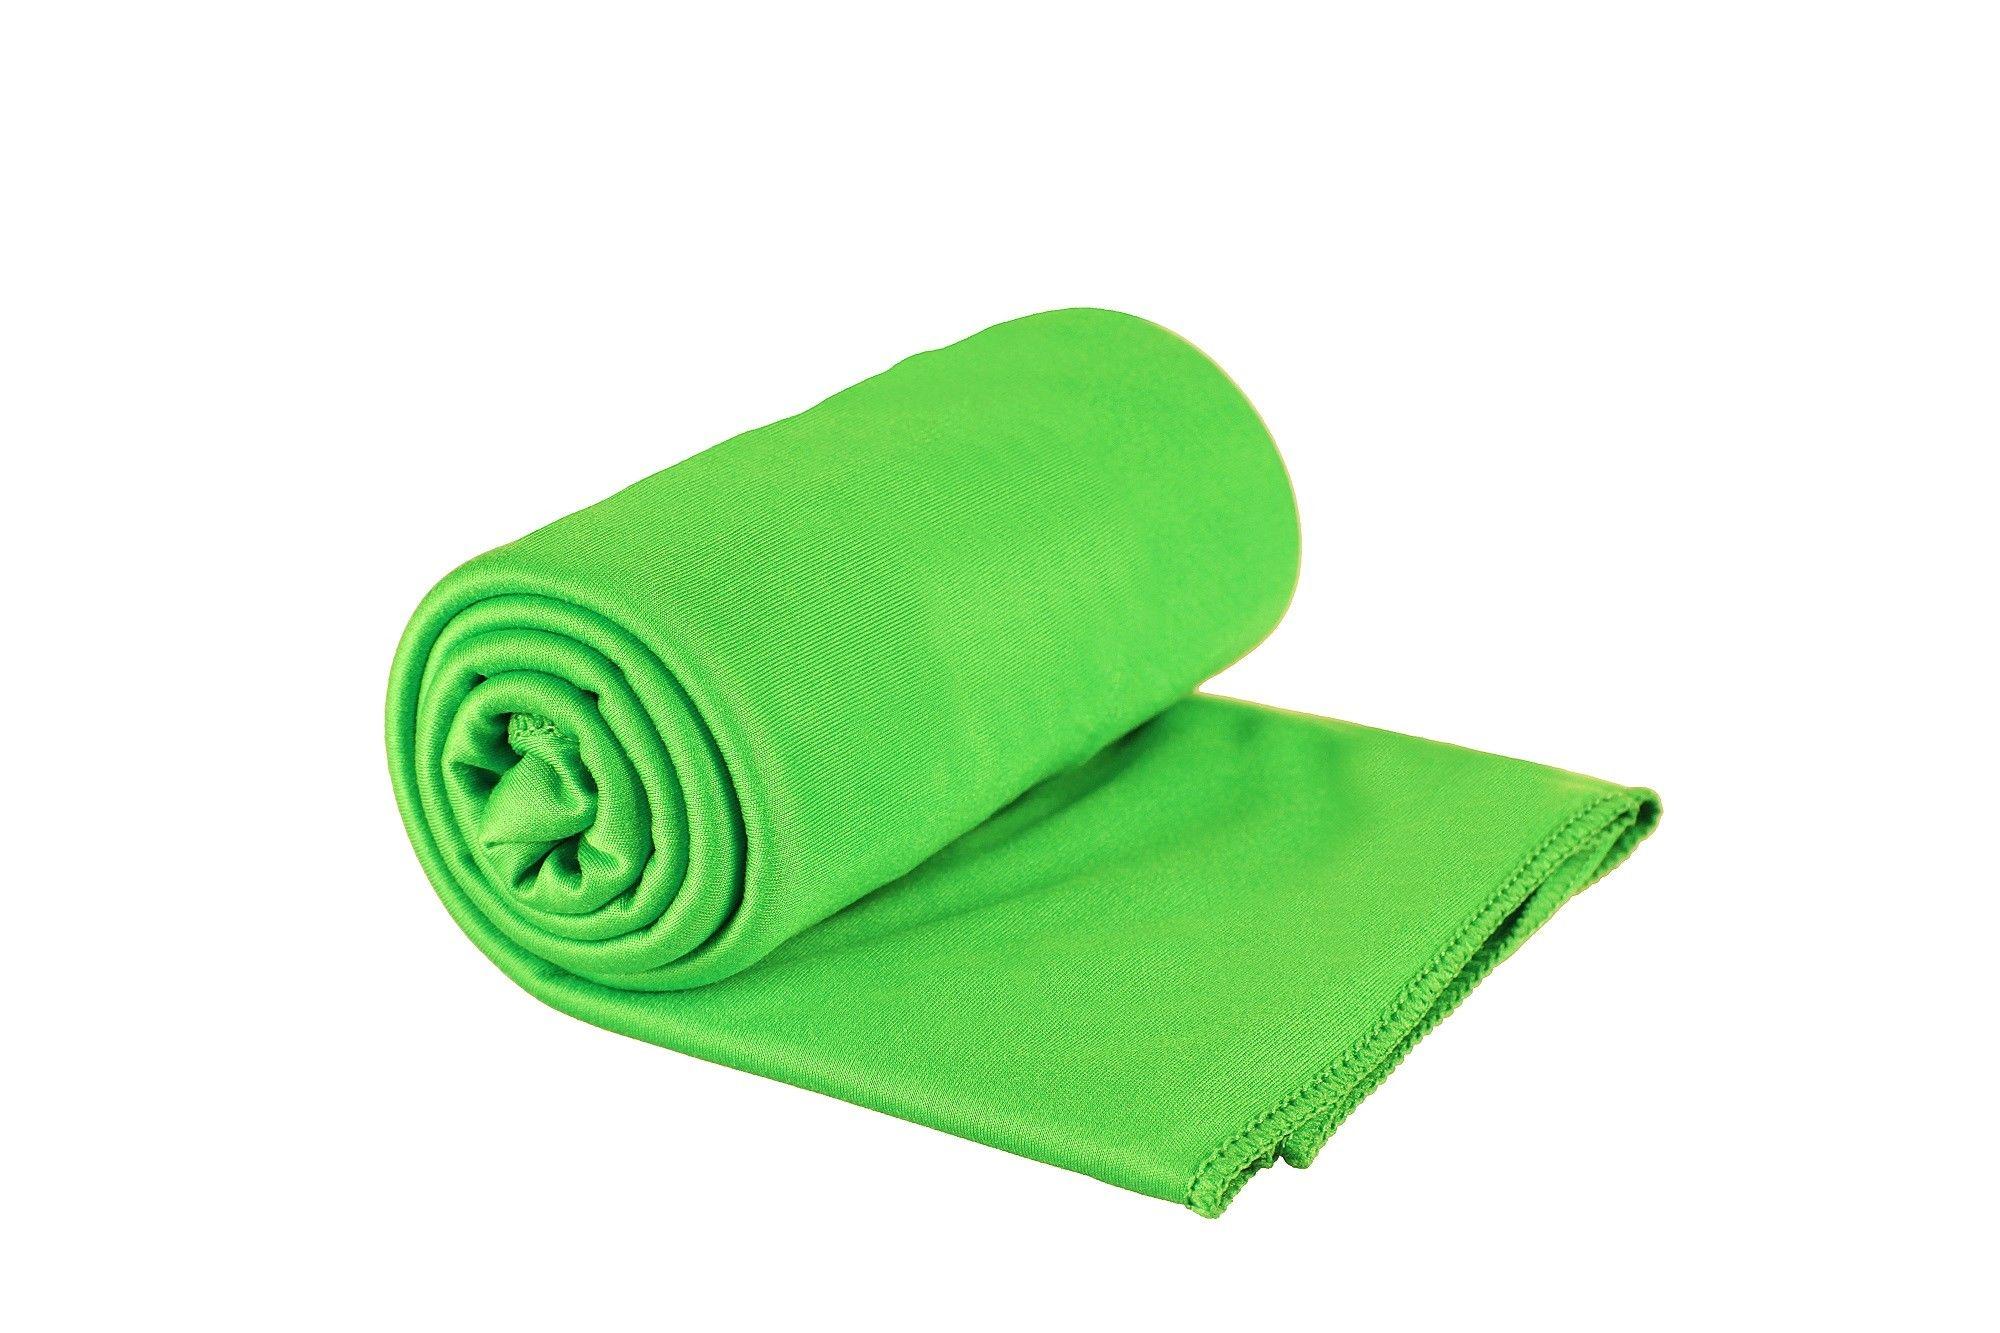 Sea to Summit Pocket Towel Small Grün, Outdoor-Hygiene, Small